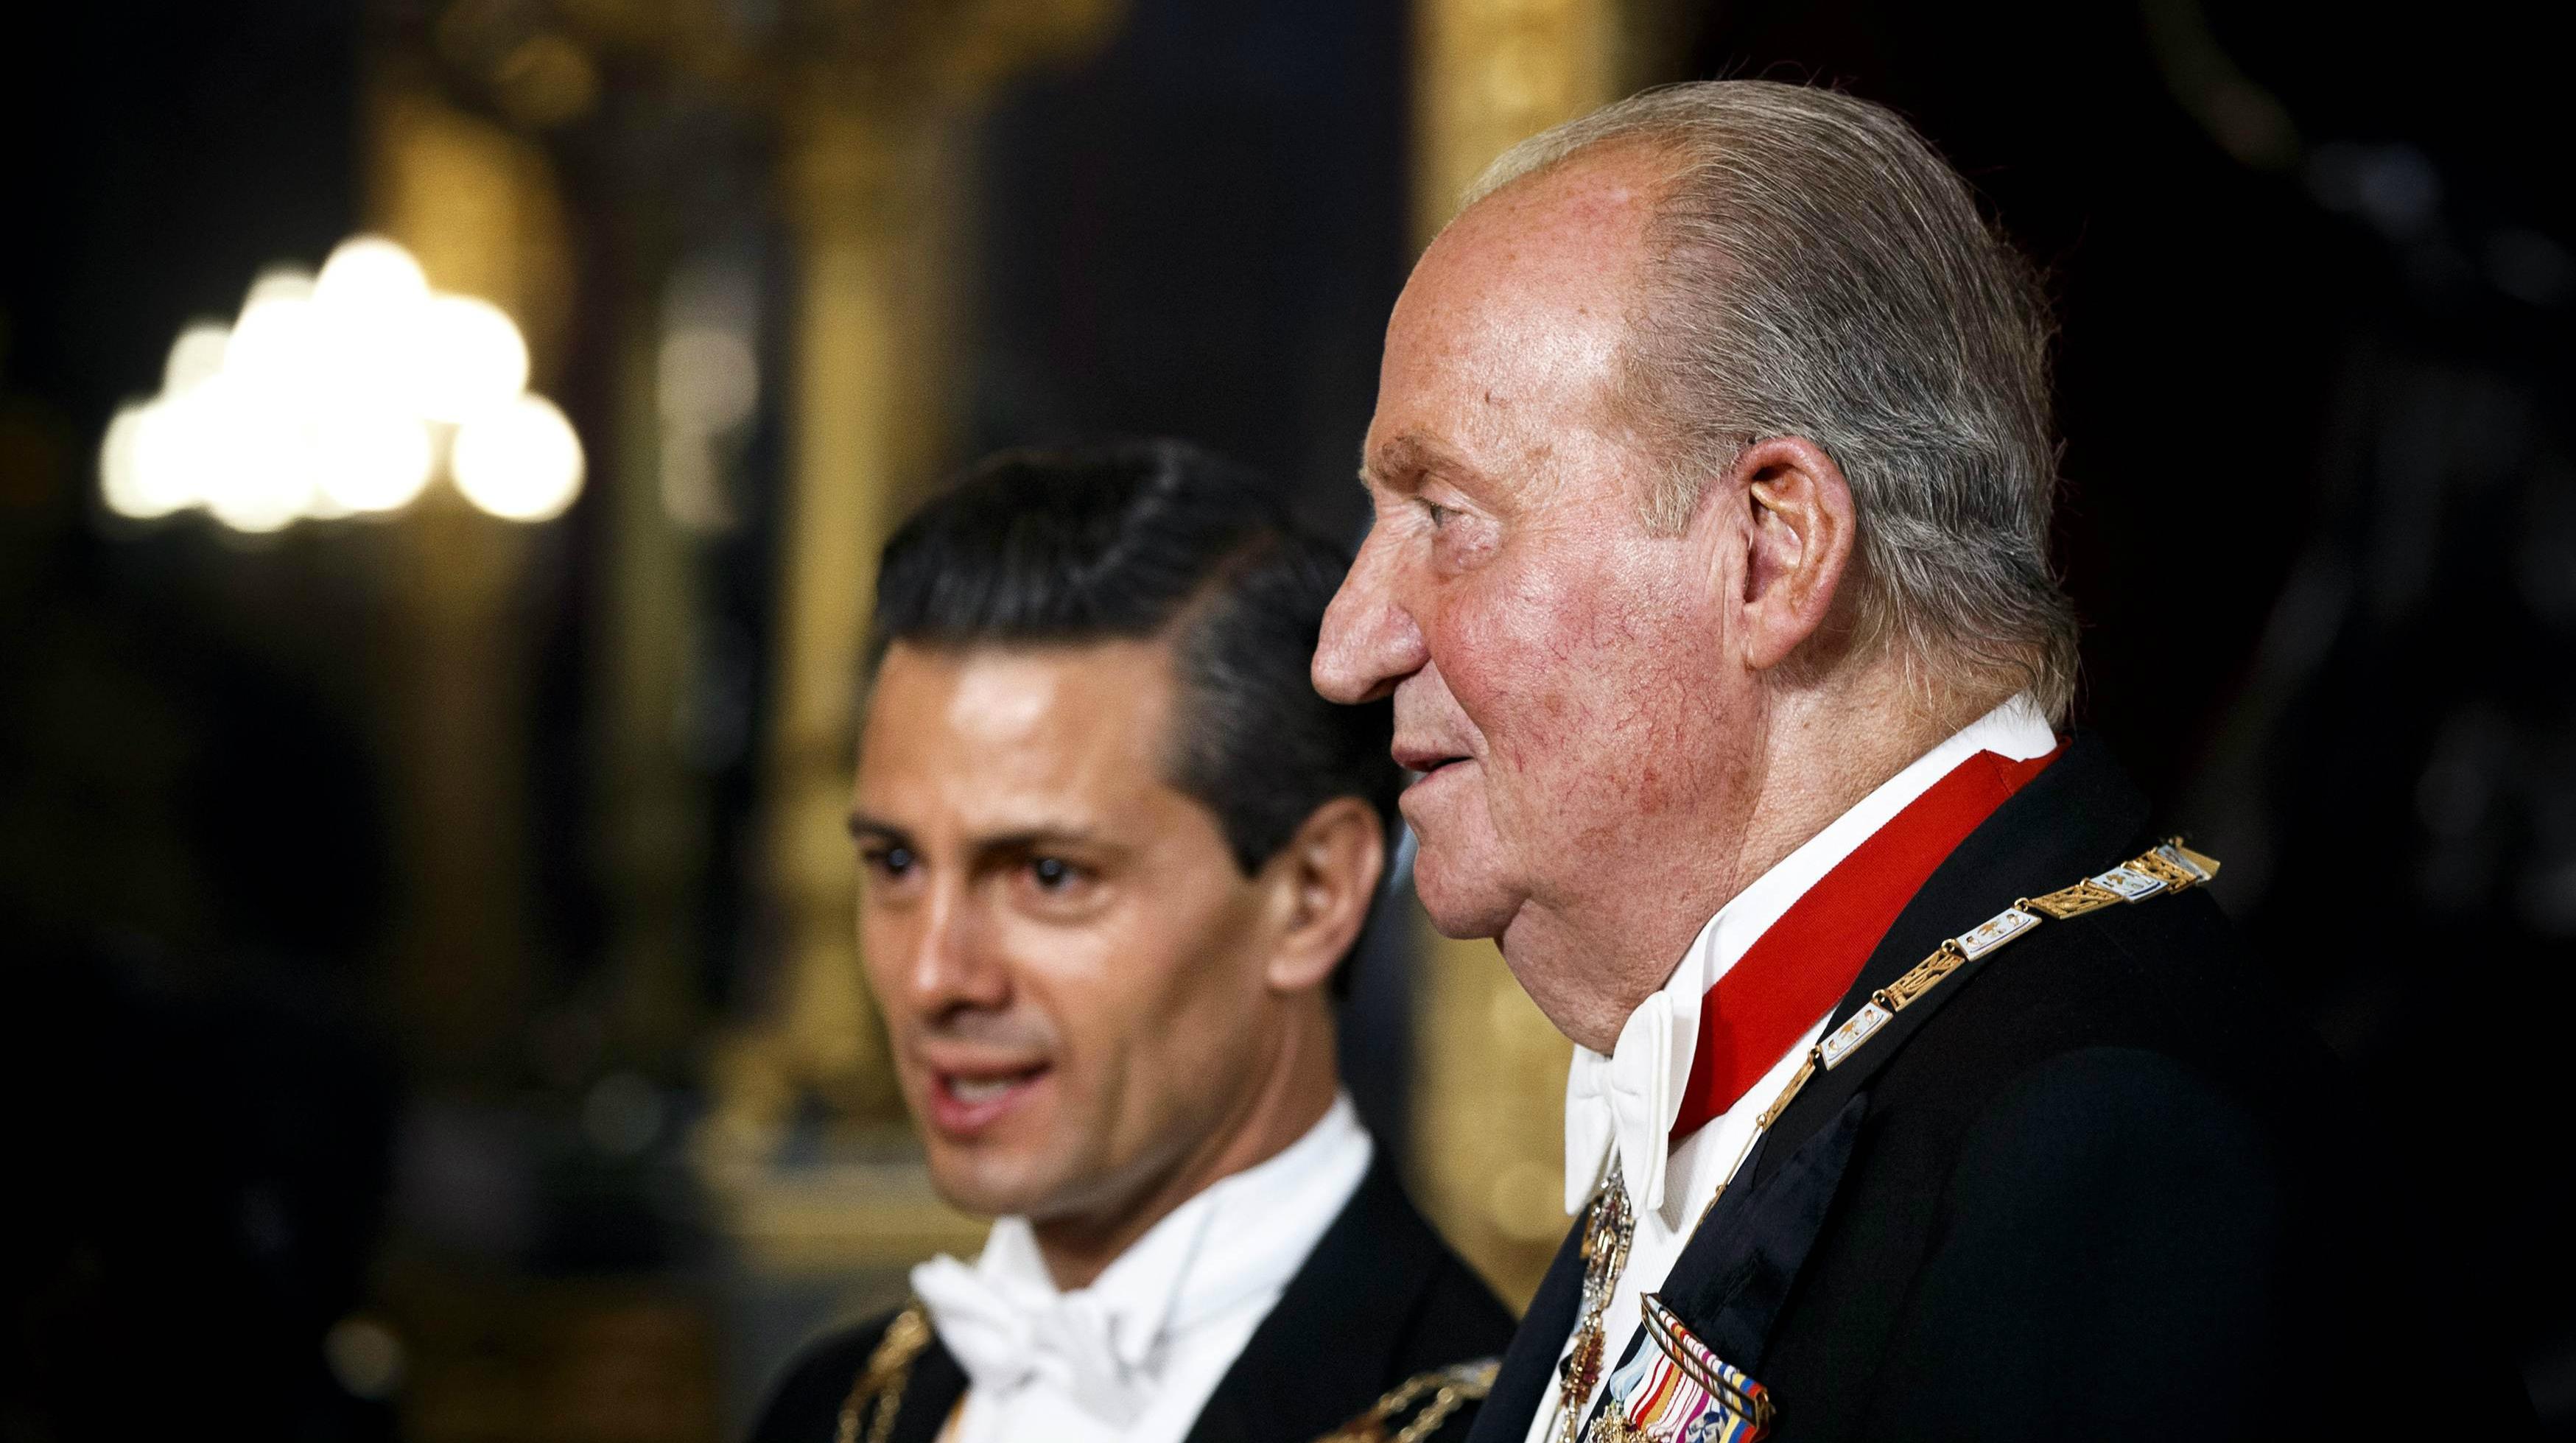 El Rei cedeix al Príncep el testimoni com a primer ambaixador davant Peña Nieto